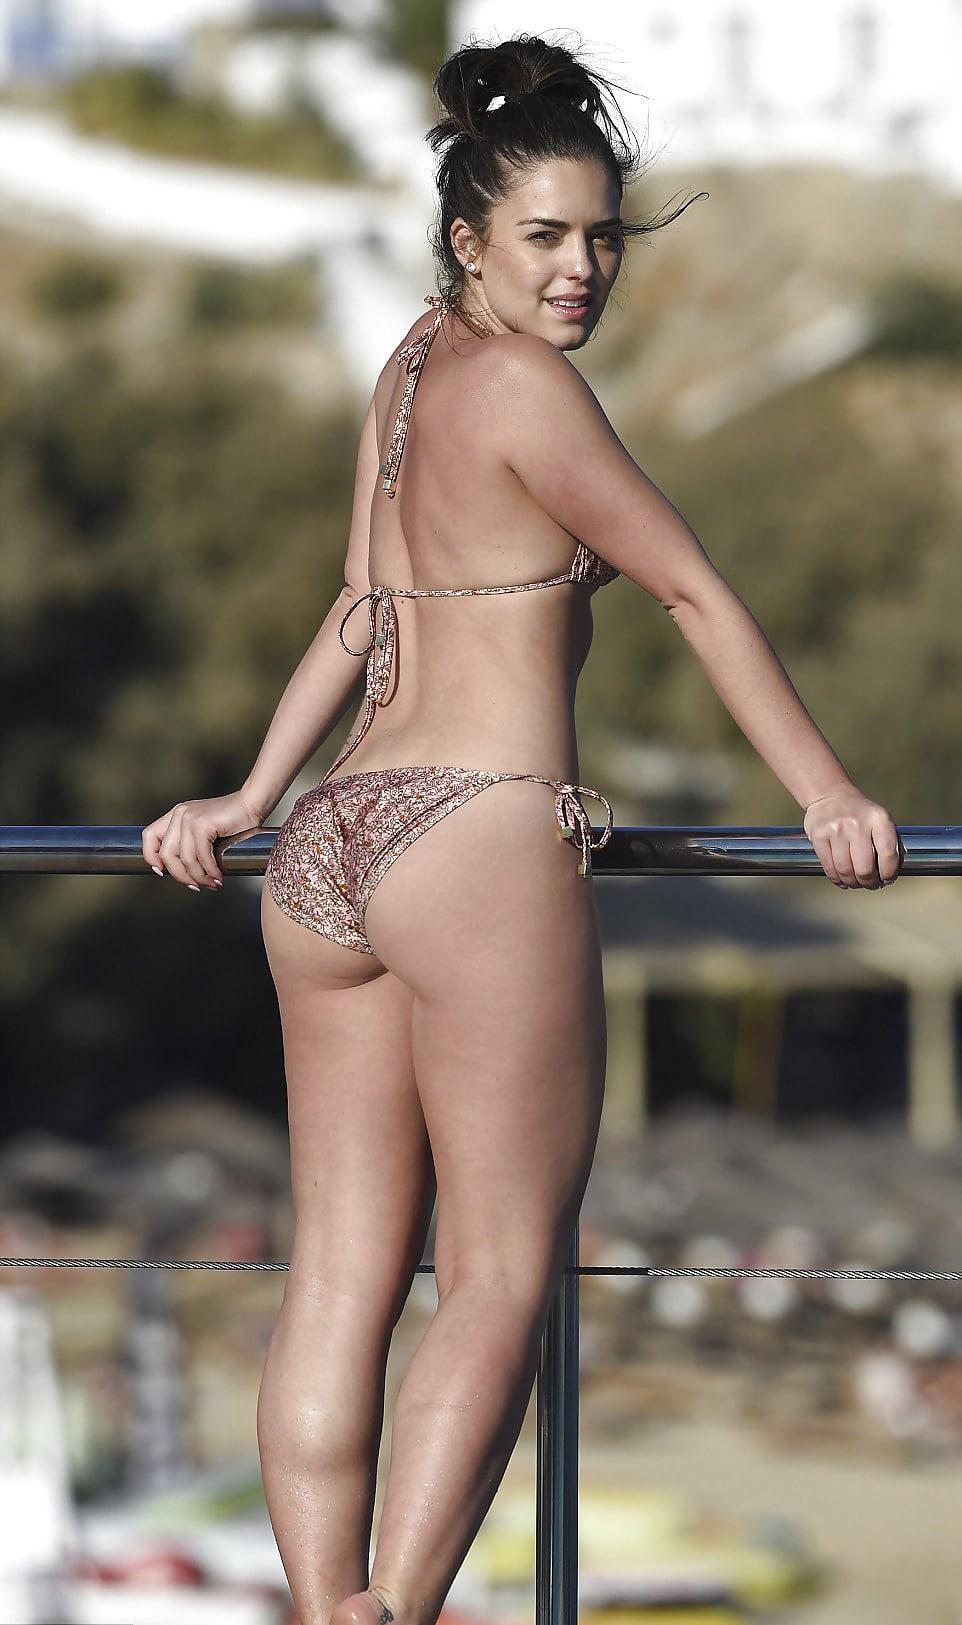 Fuck Olympia Valance naked (73 photo), Pussy, Paparazzi, Boobs, swimsuit 2020